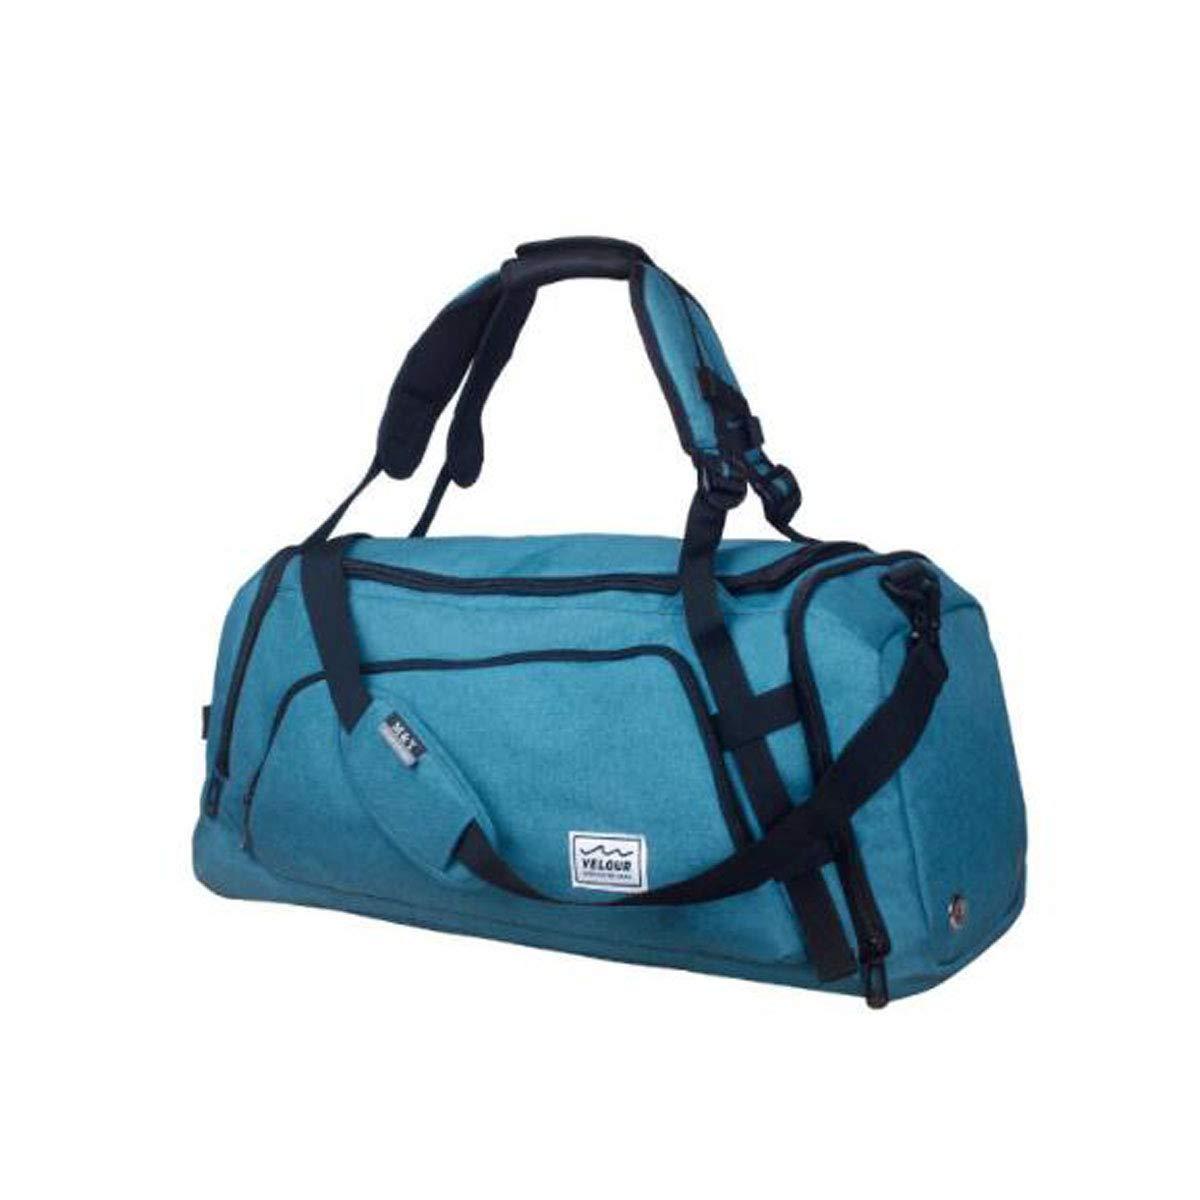 Jinnuotong スポーツバッグ 旅行用 大容量 ショルダーバッグ 男女兼用 防水 トラベルバッグ Lサイズ 57/26/28cm とても美しい B07RLYWW9Z ブルー 22.8*10.4*11.2 inch.